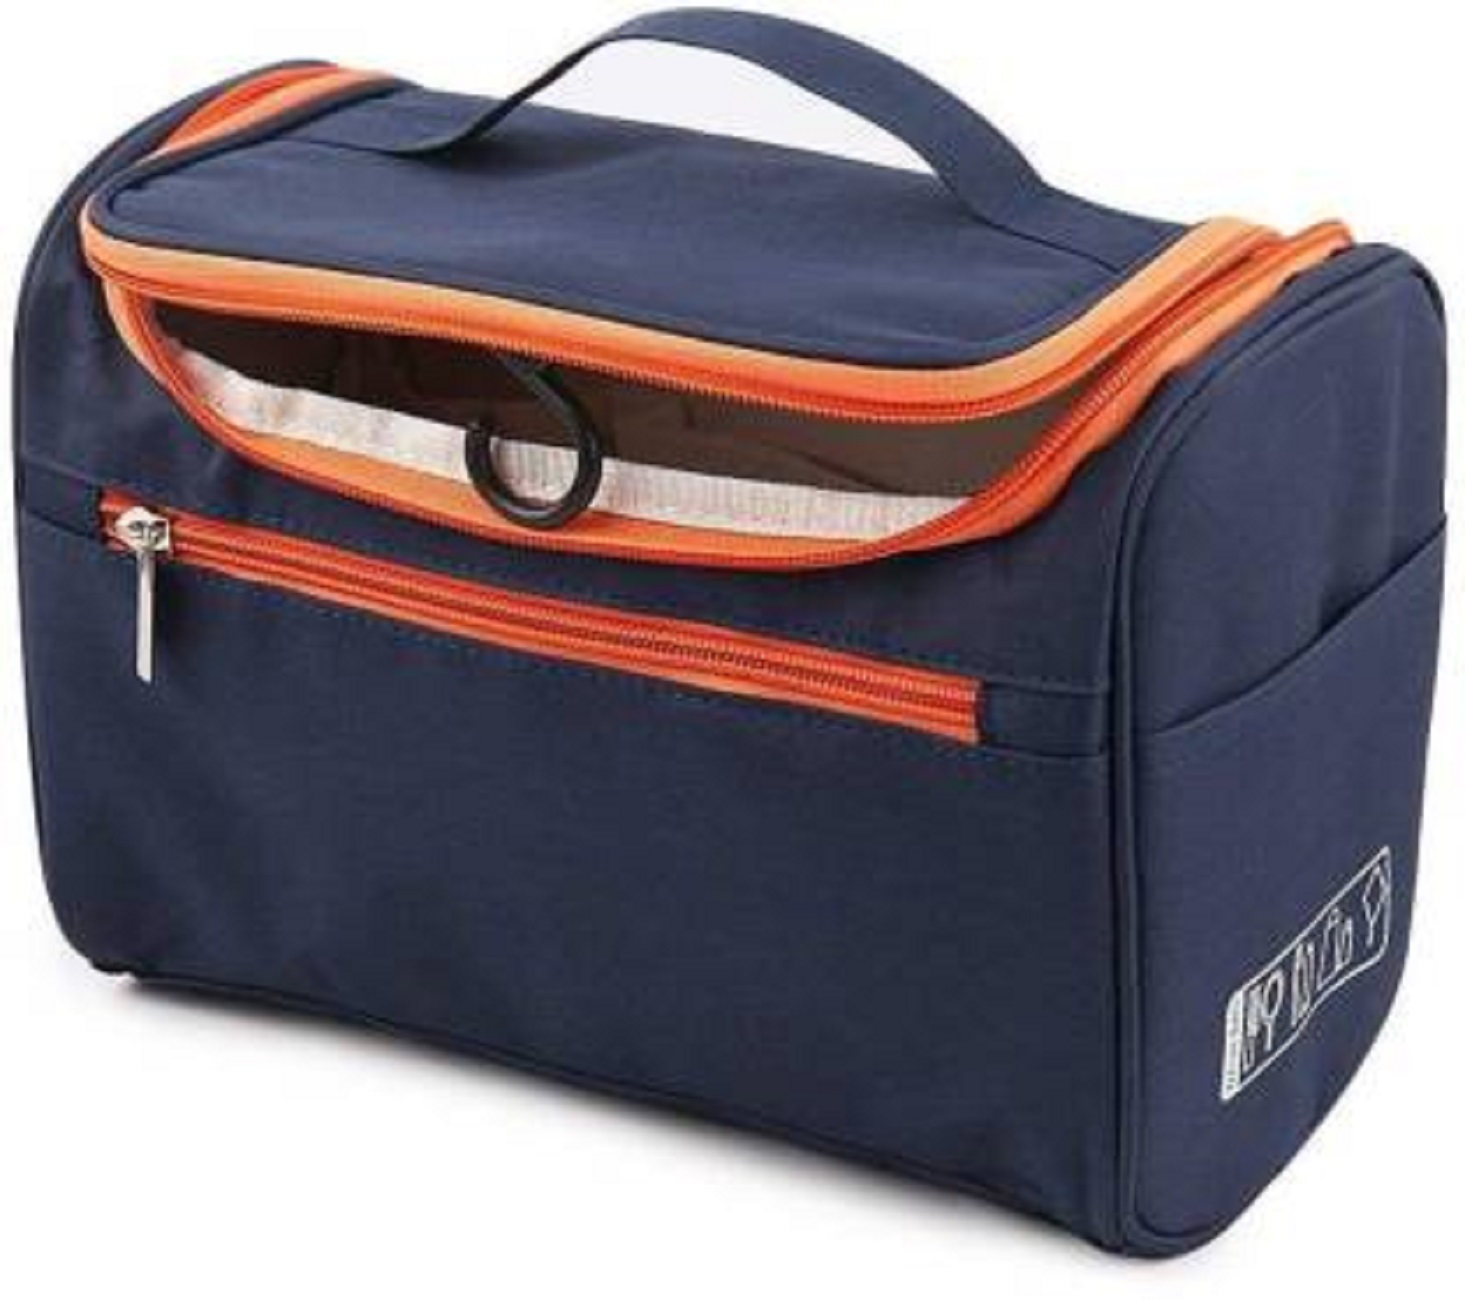 KINGS MAKER Multifunctional Travel Bag Extra Large Makeup Organiser Cosmetic Case